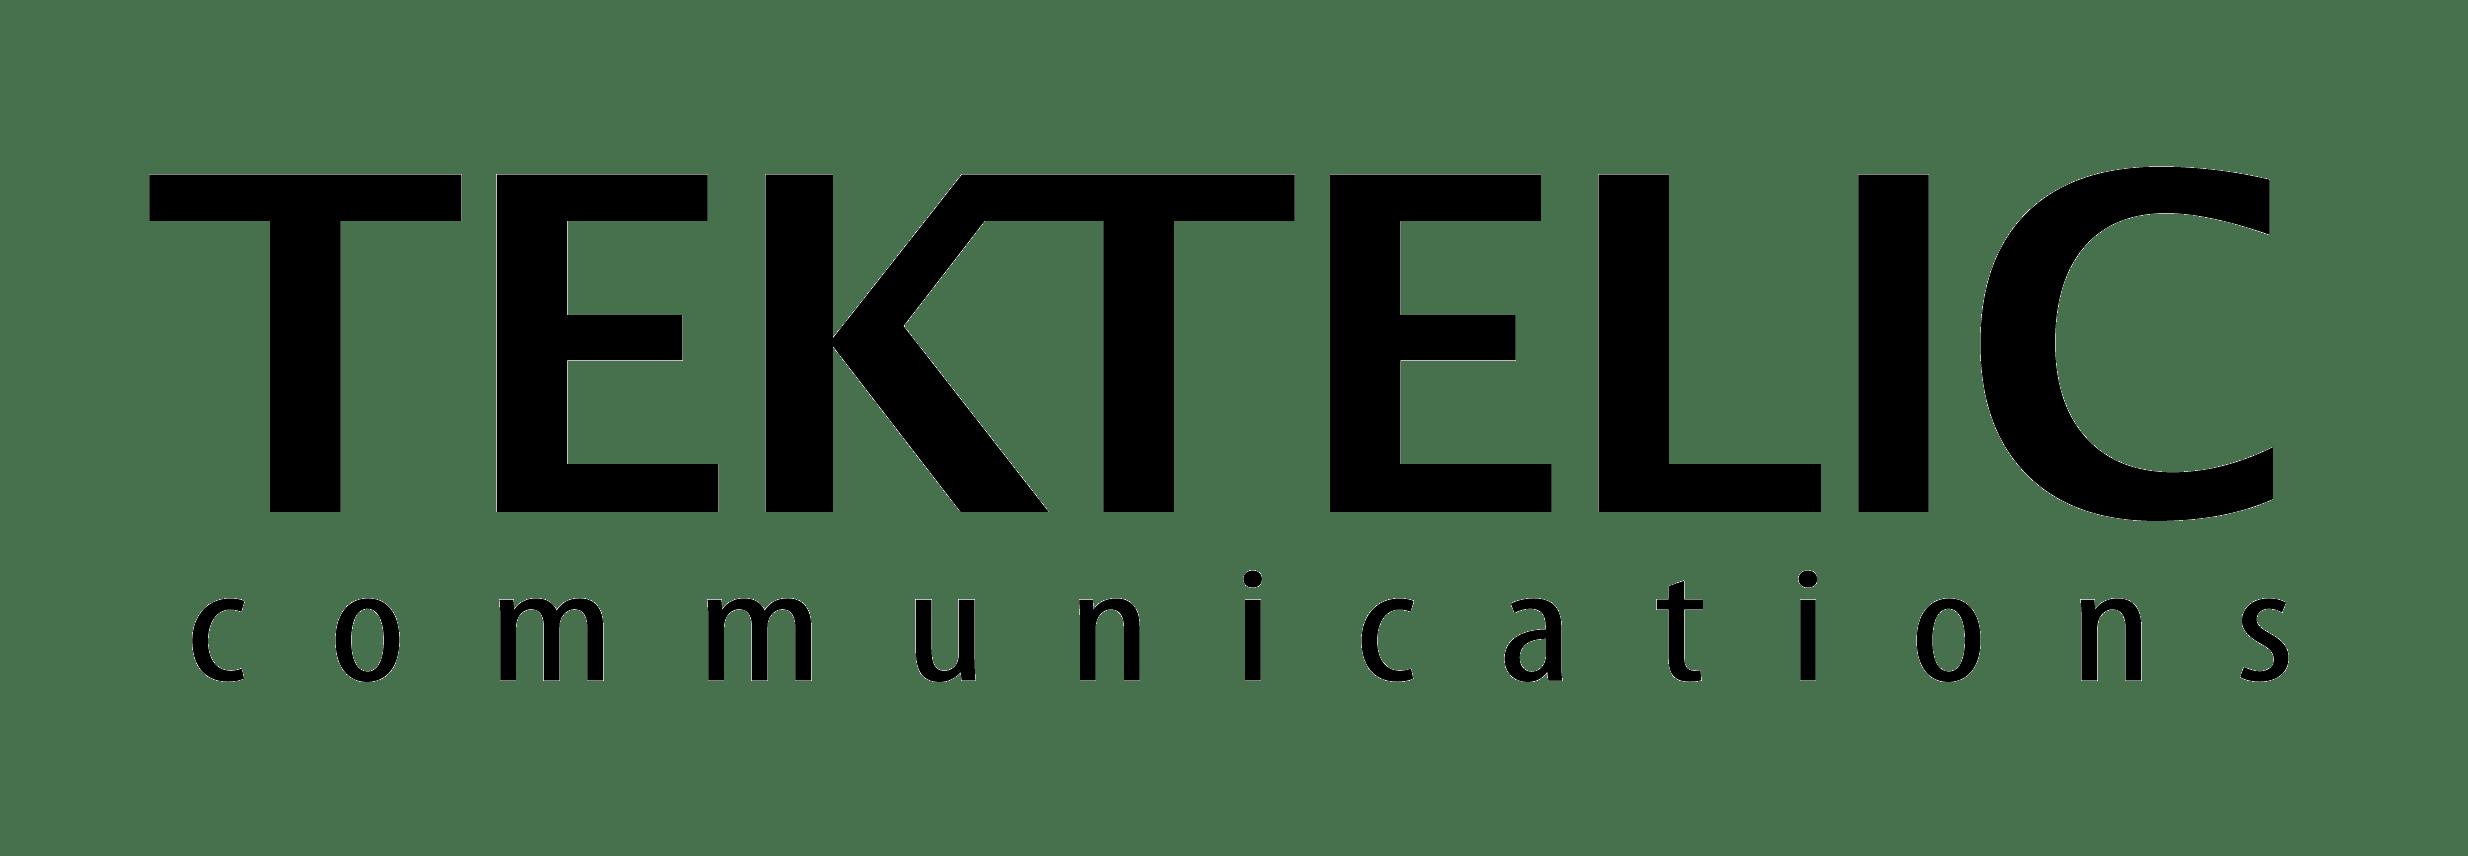 TEKTELIC Communications Inc.